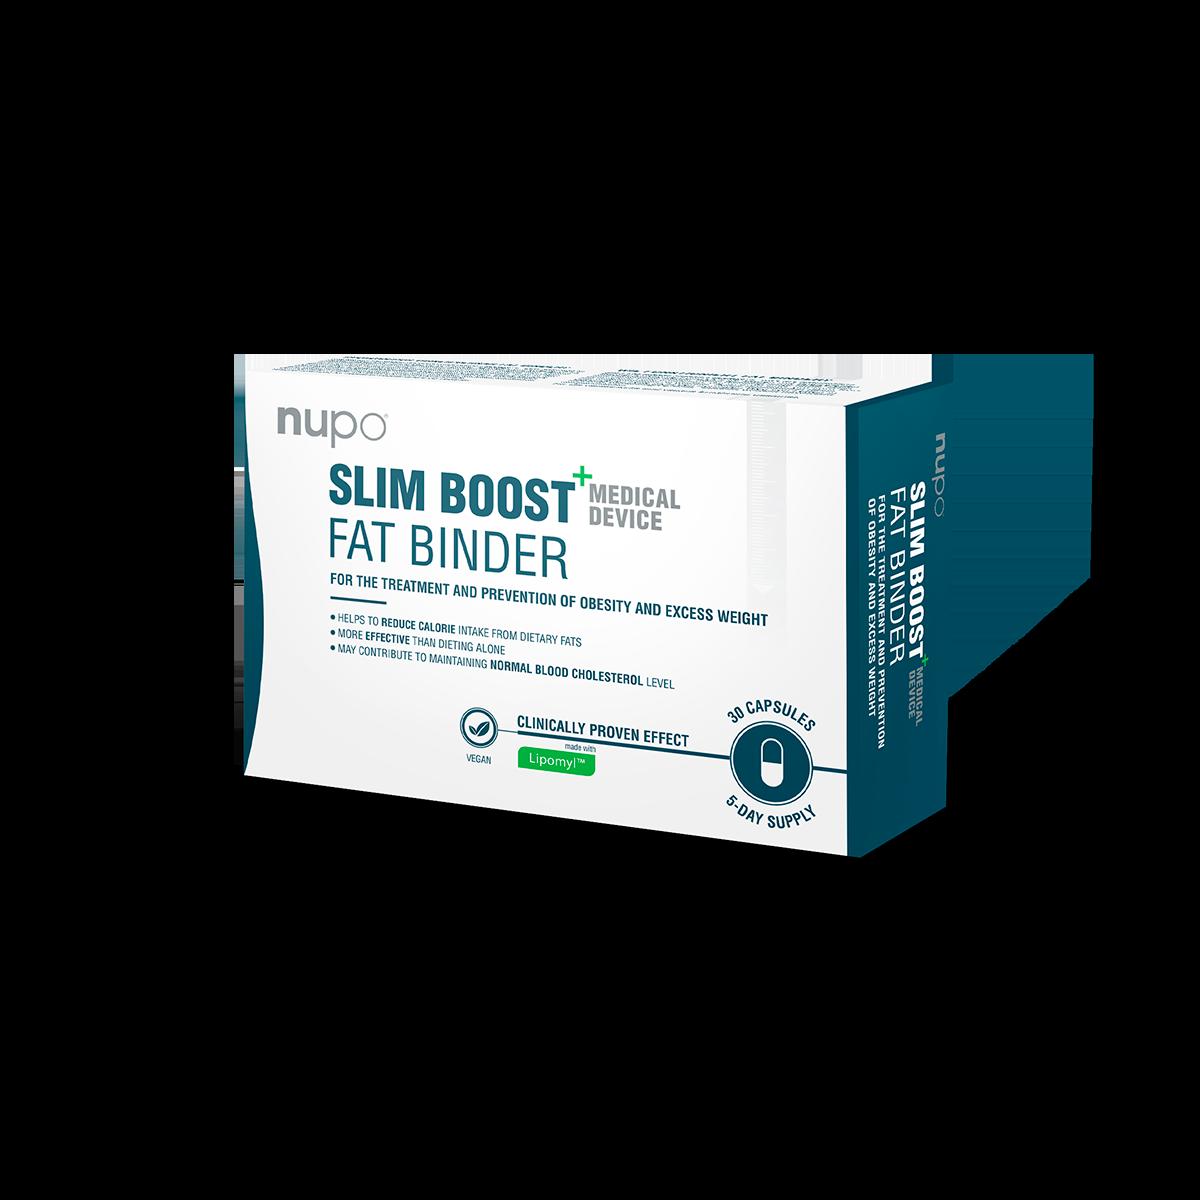 Image of Nupo Slim Boost+ Fat Binder (12700)